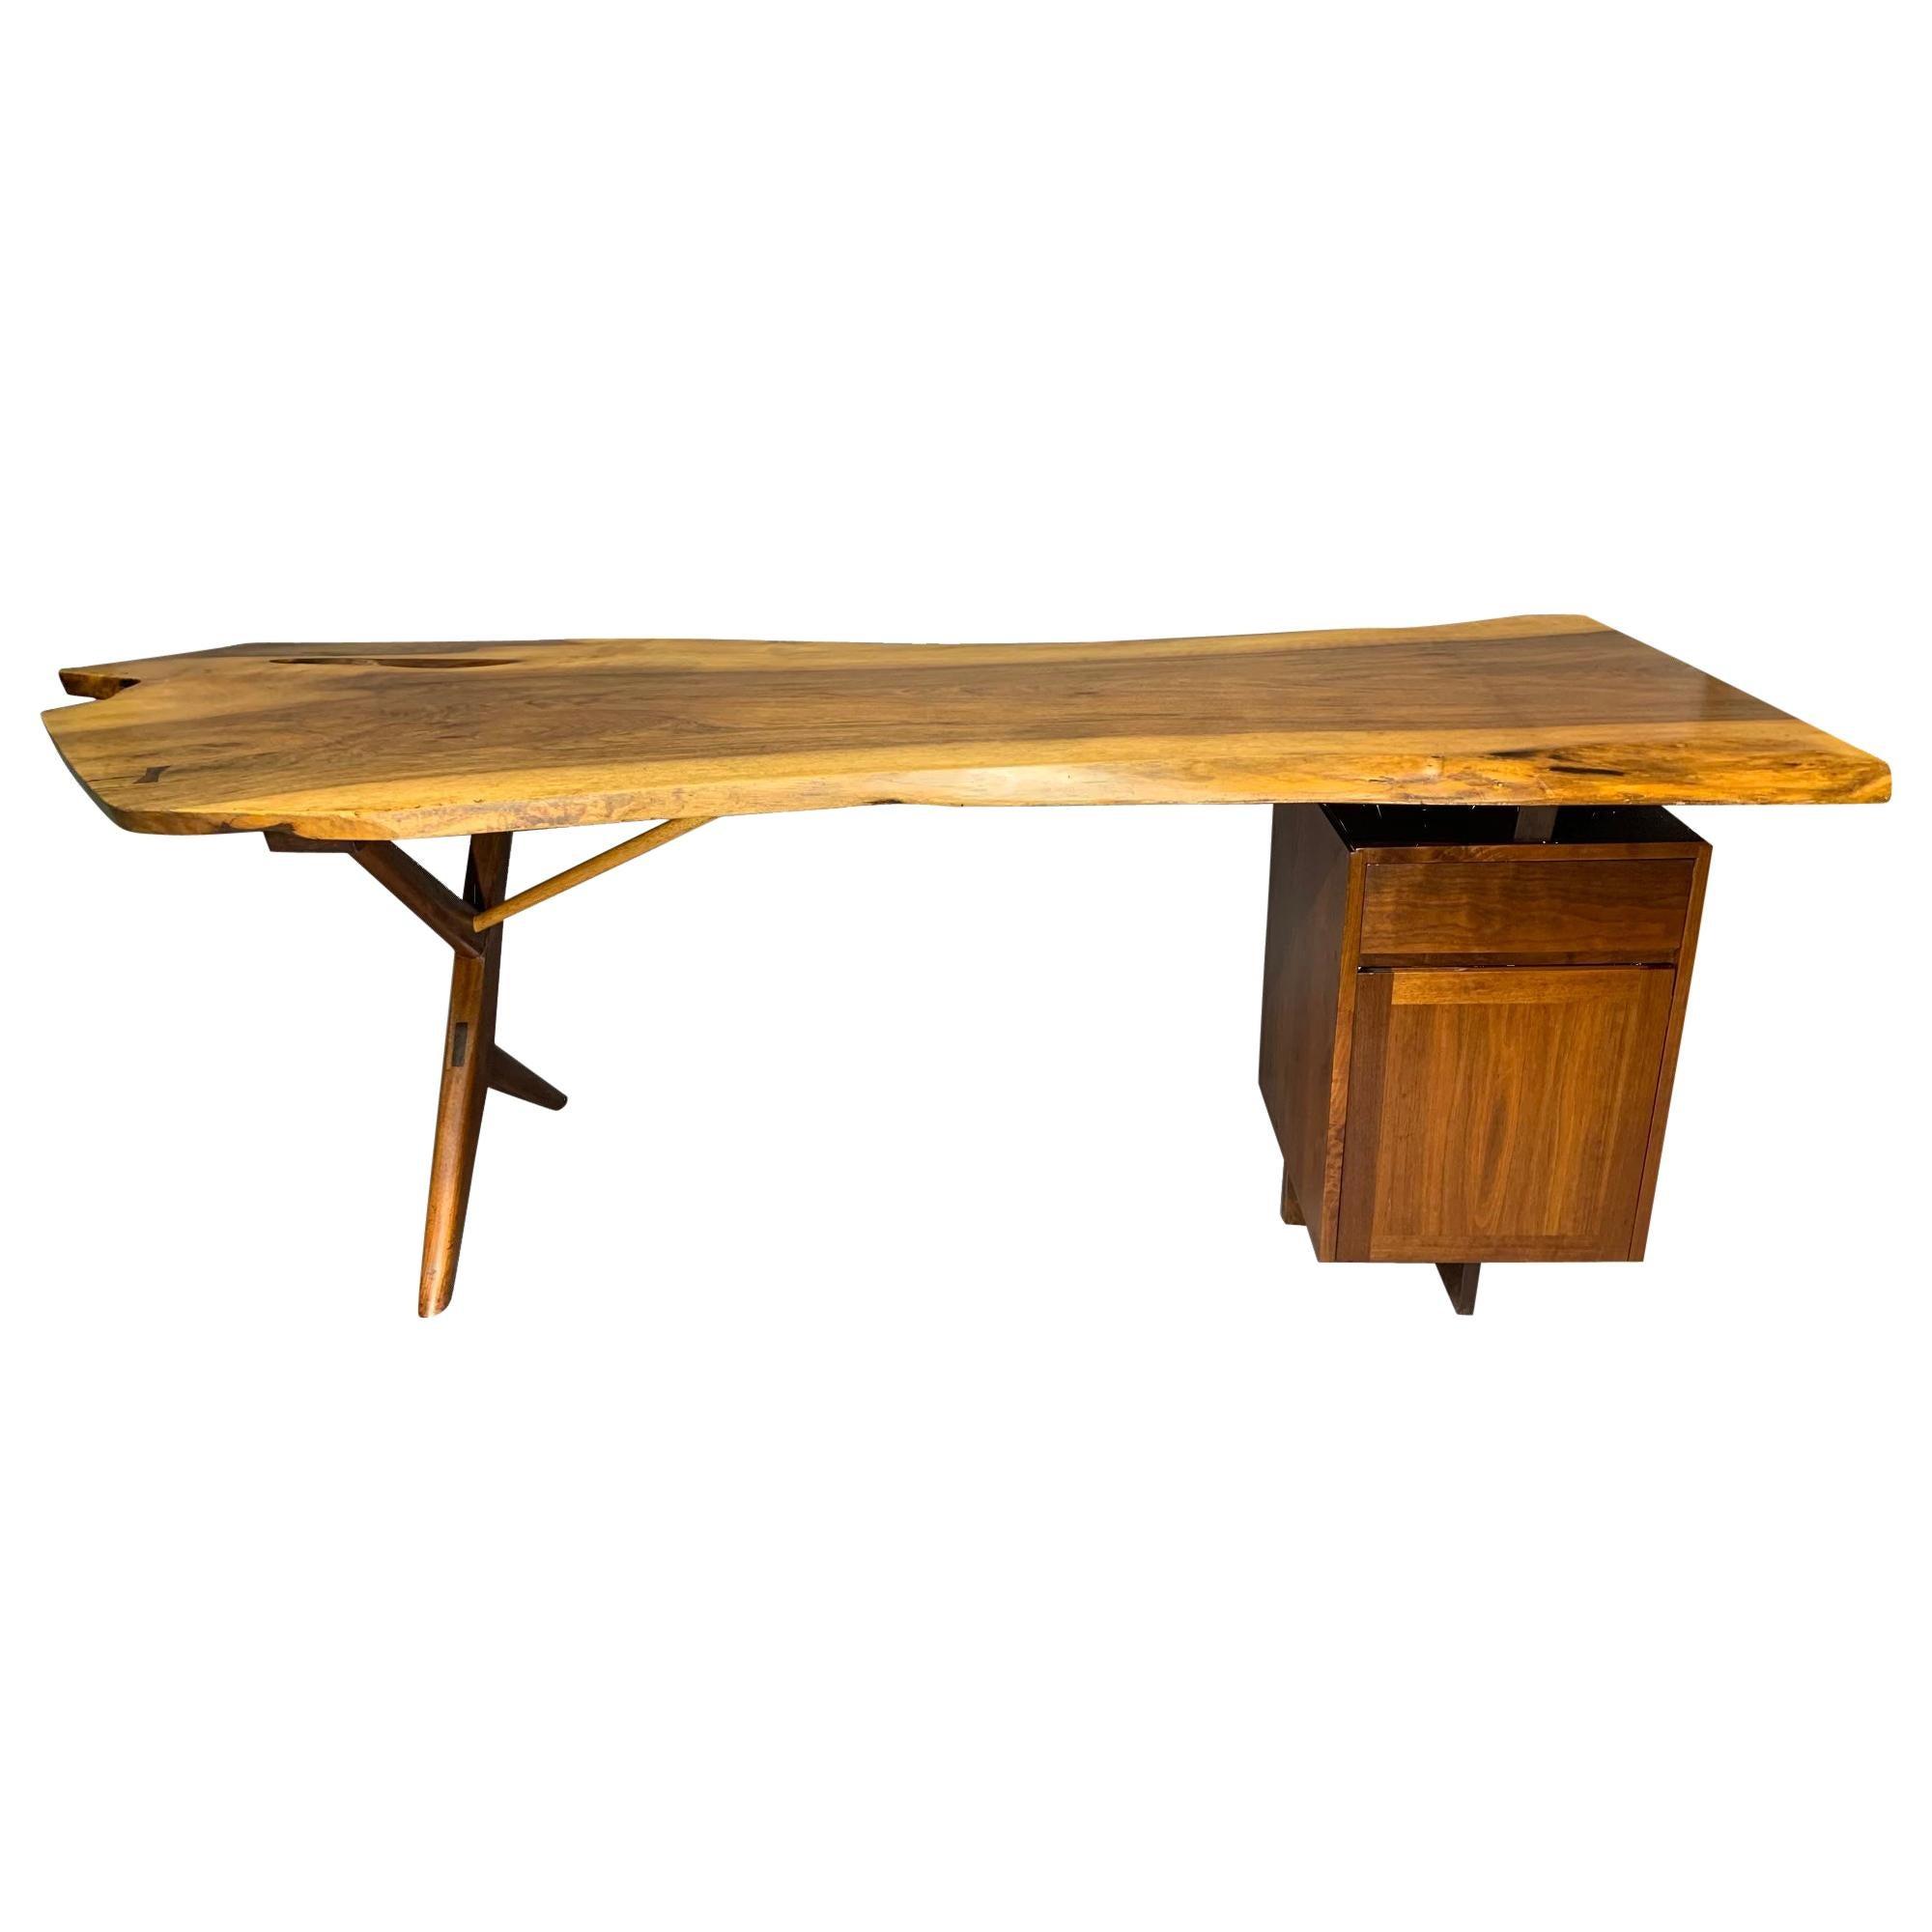 George Nakashima Large Conoid Writing Desk with Free-Form Edge Top